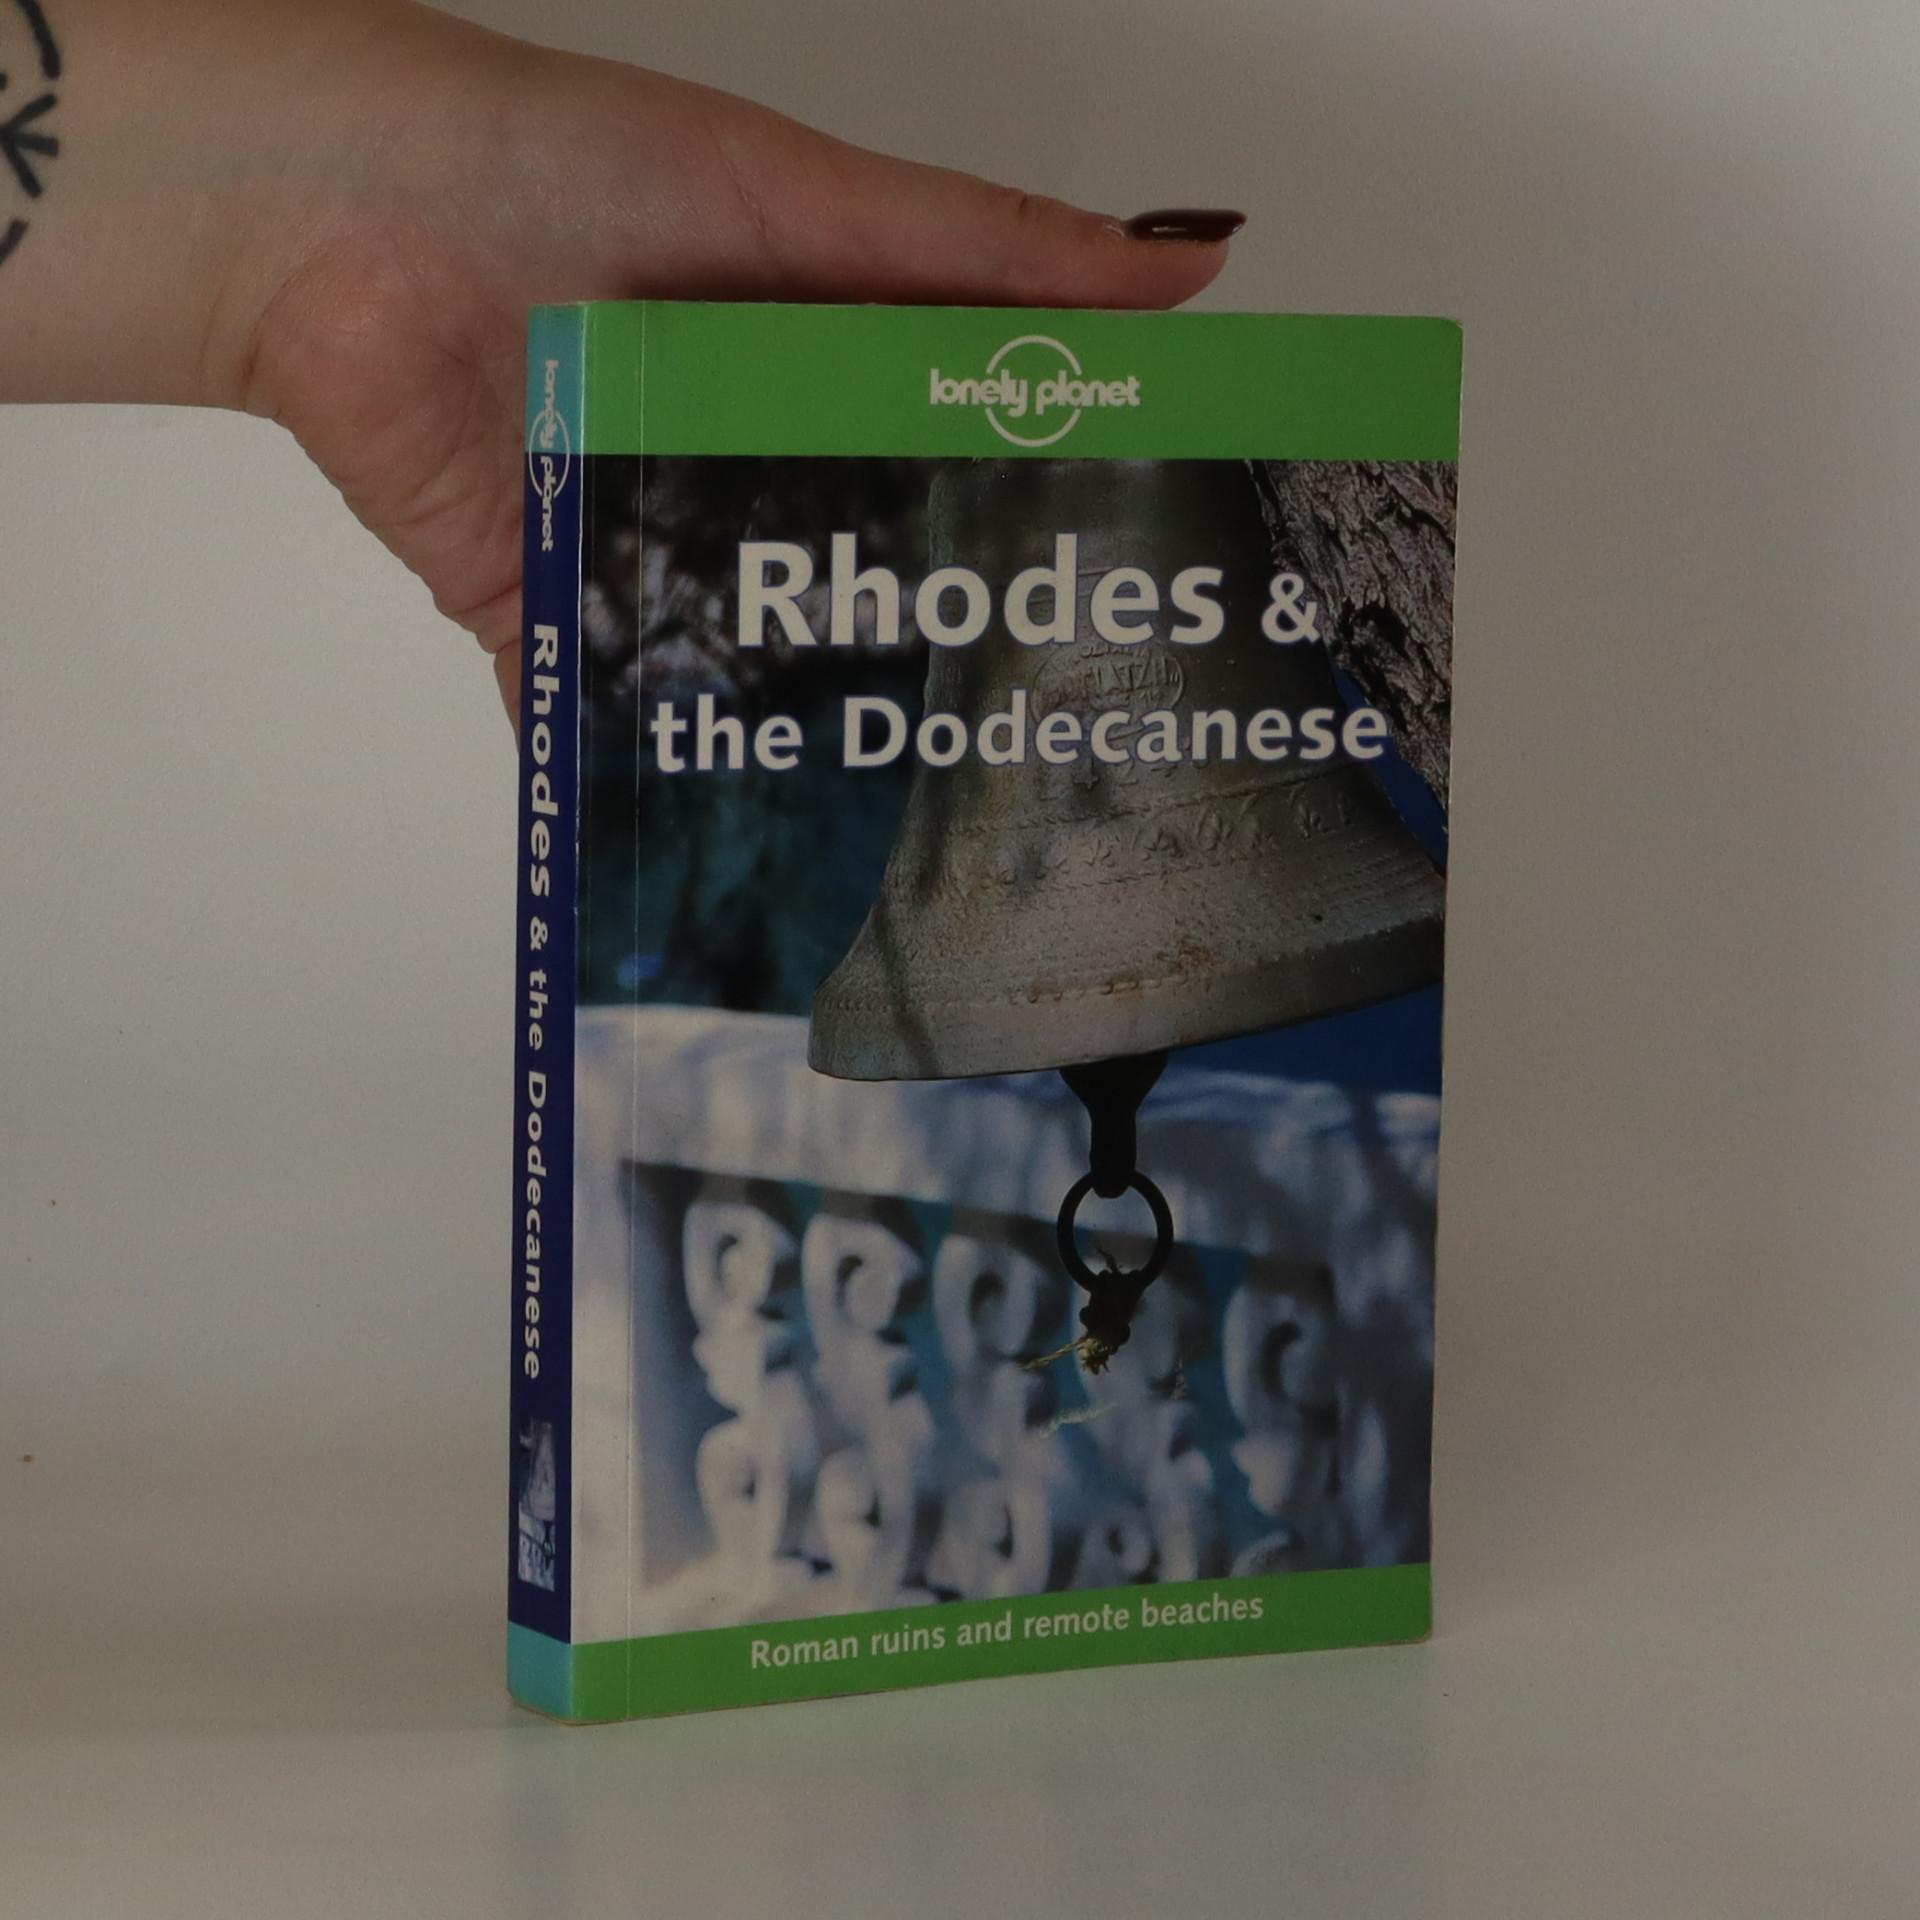 antikvární kniha Rhodes & the Dodecanese, 2001